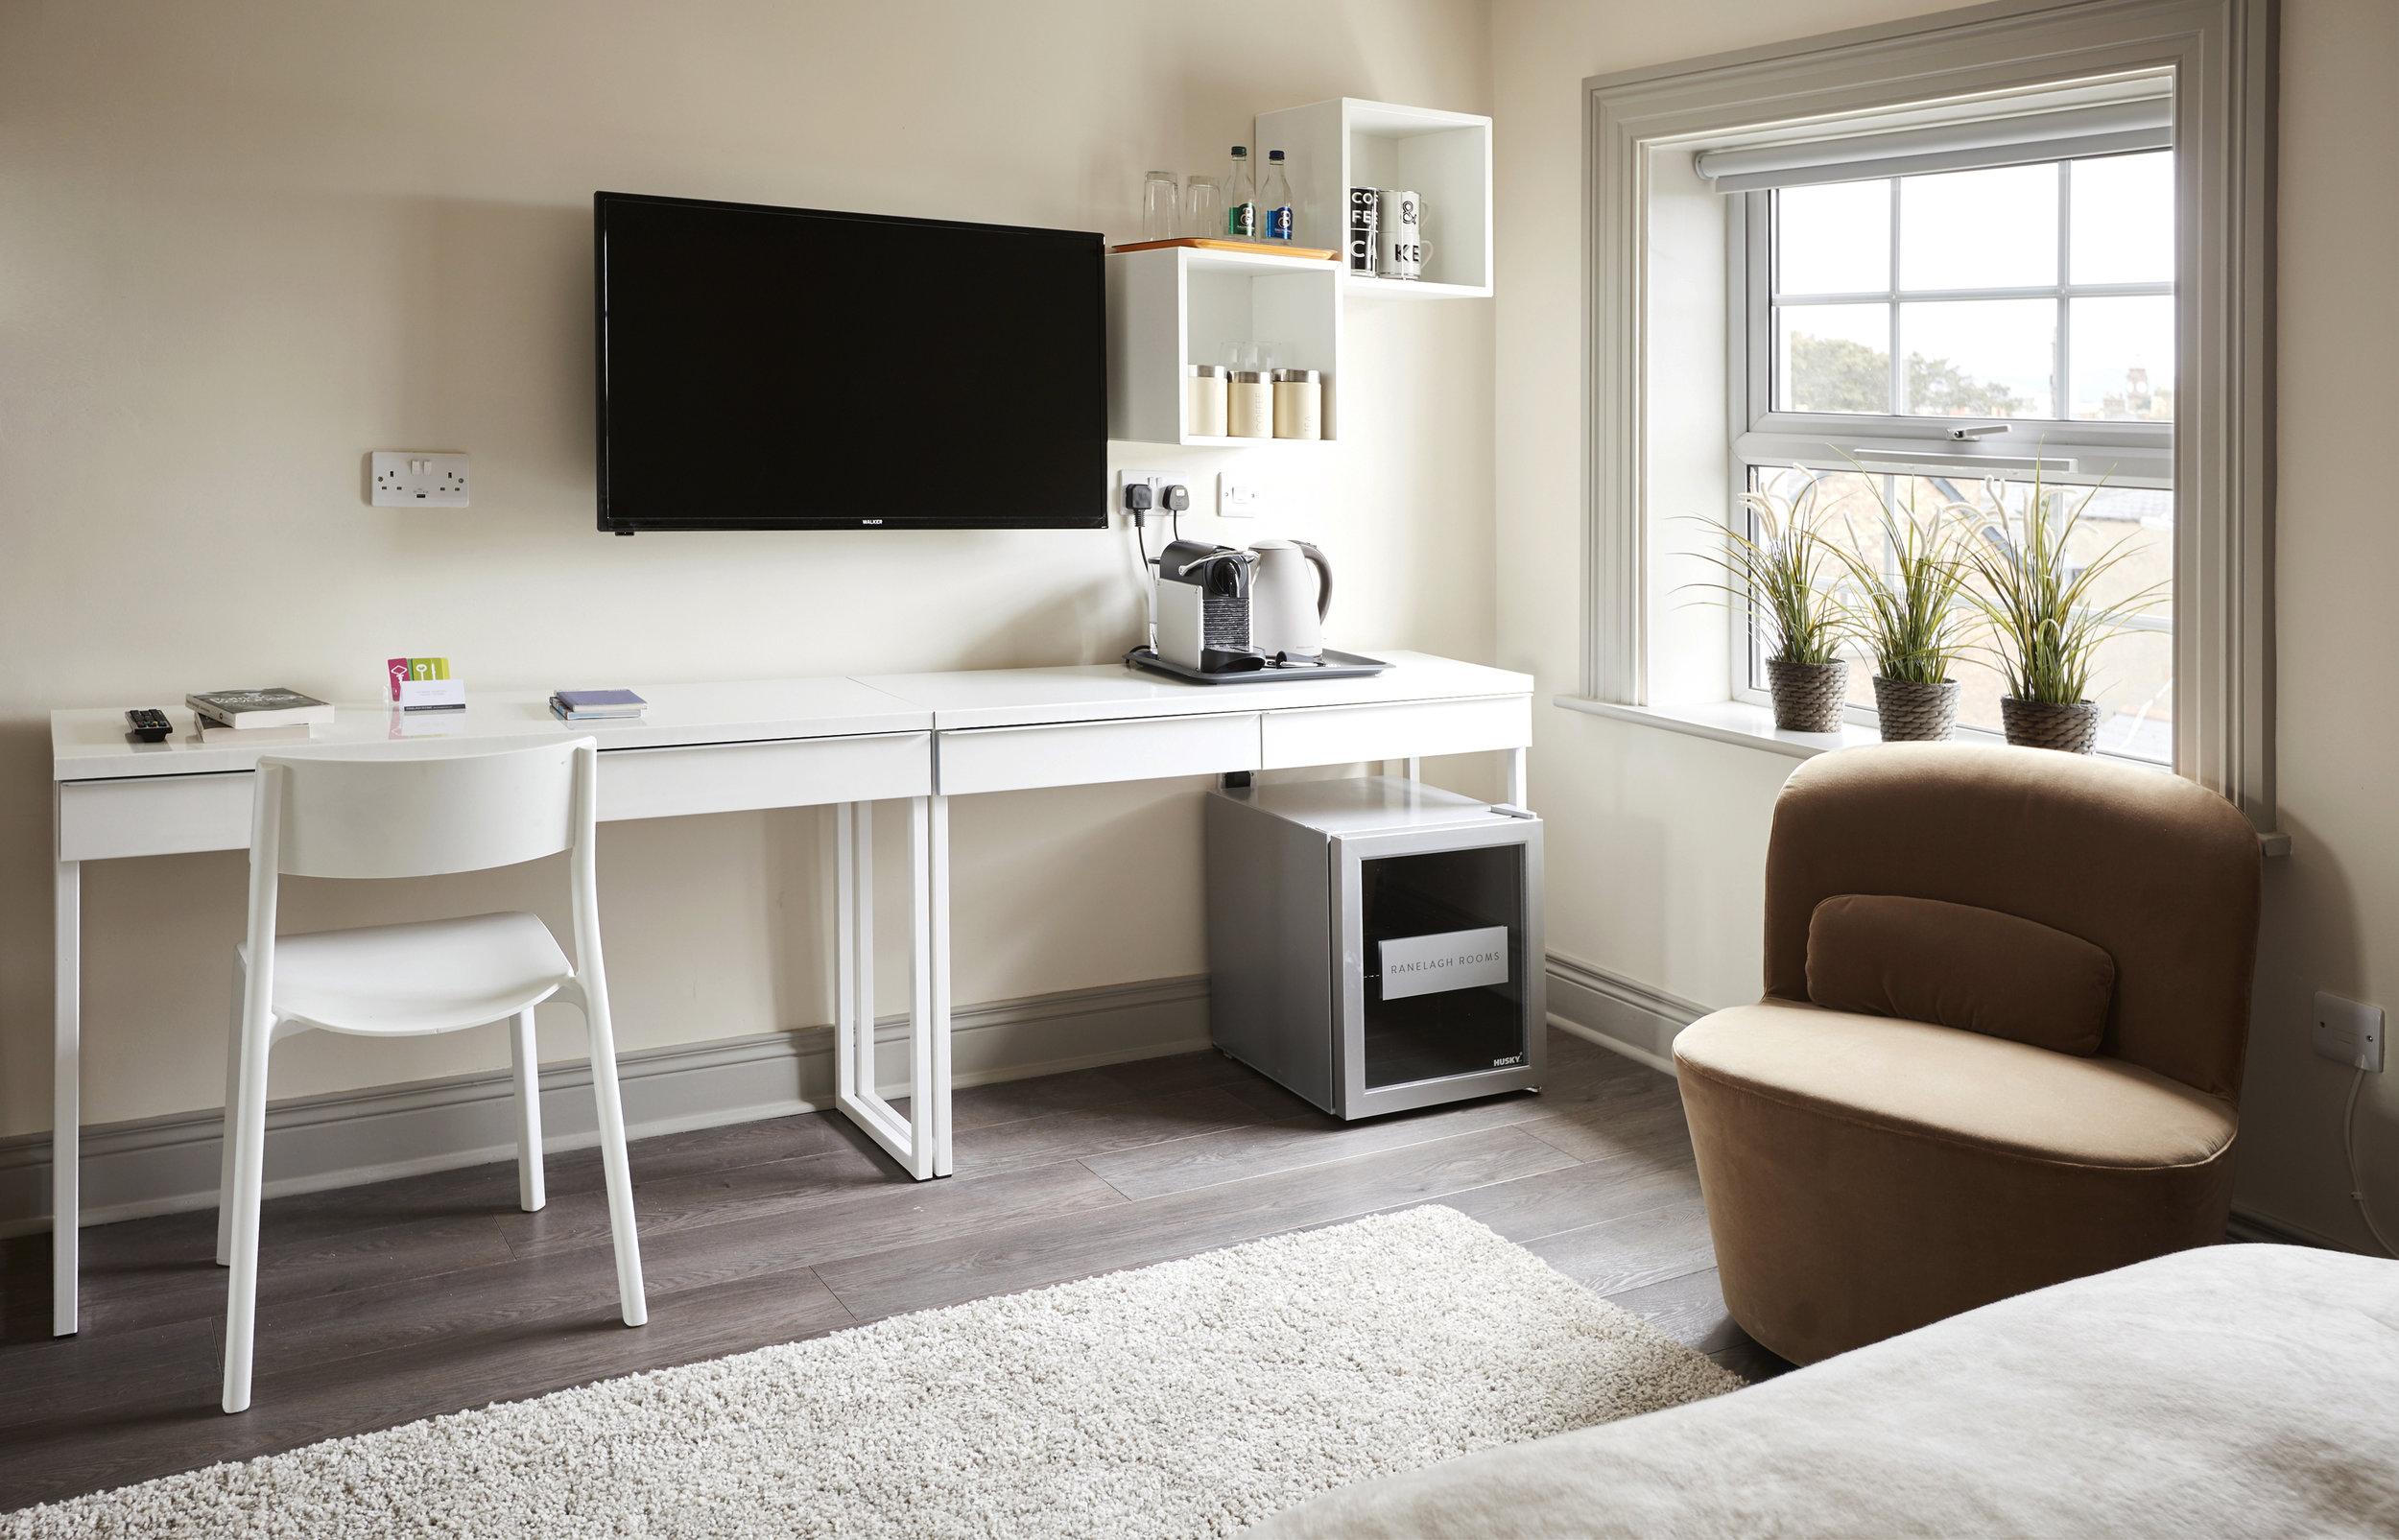 Patrick Kavanagh Room - Desk.jpg